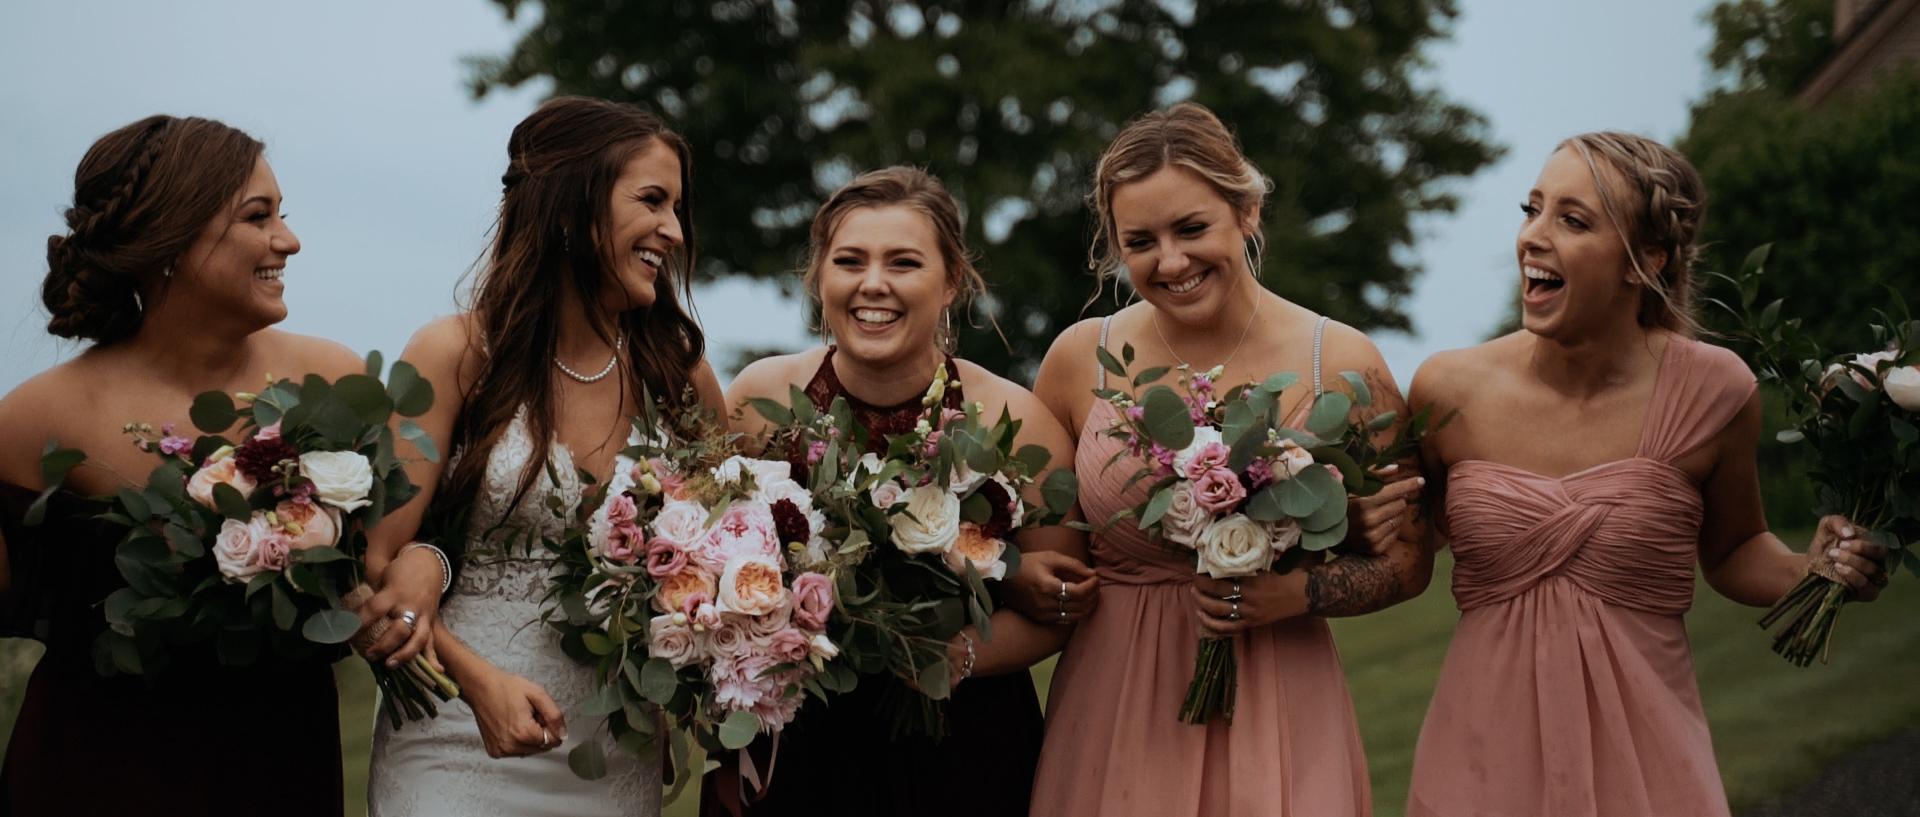 Beech Hill Barn Pittston Maine Wedding 9